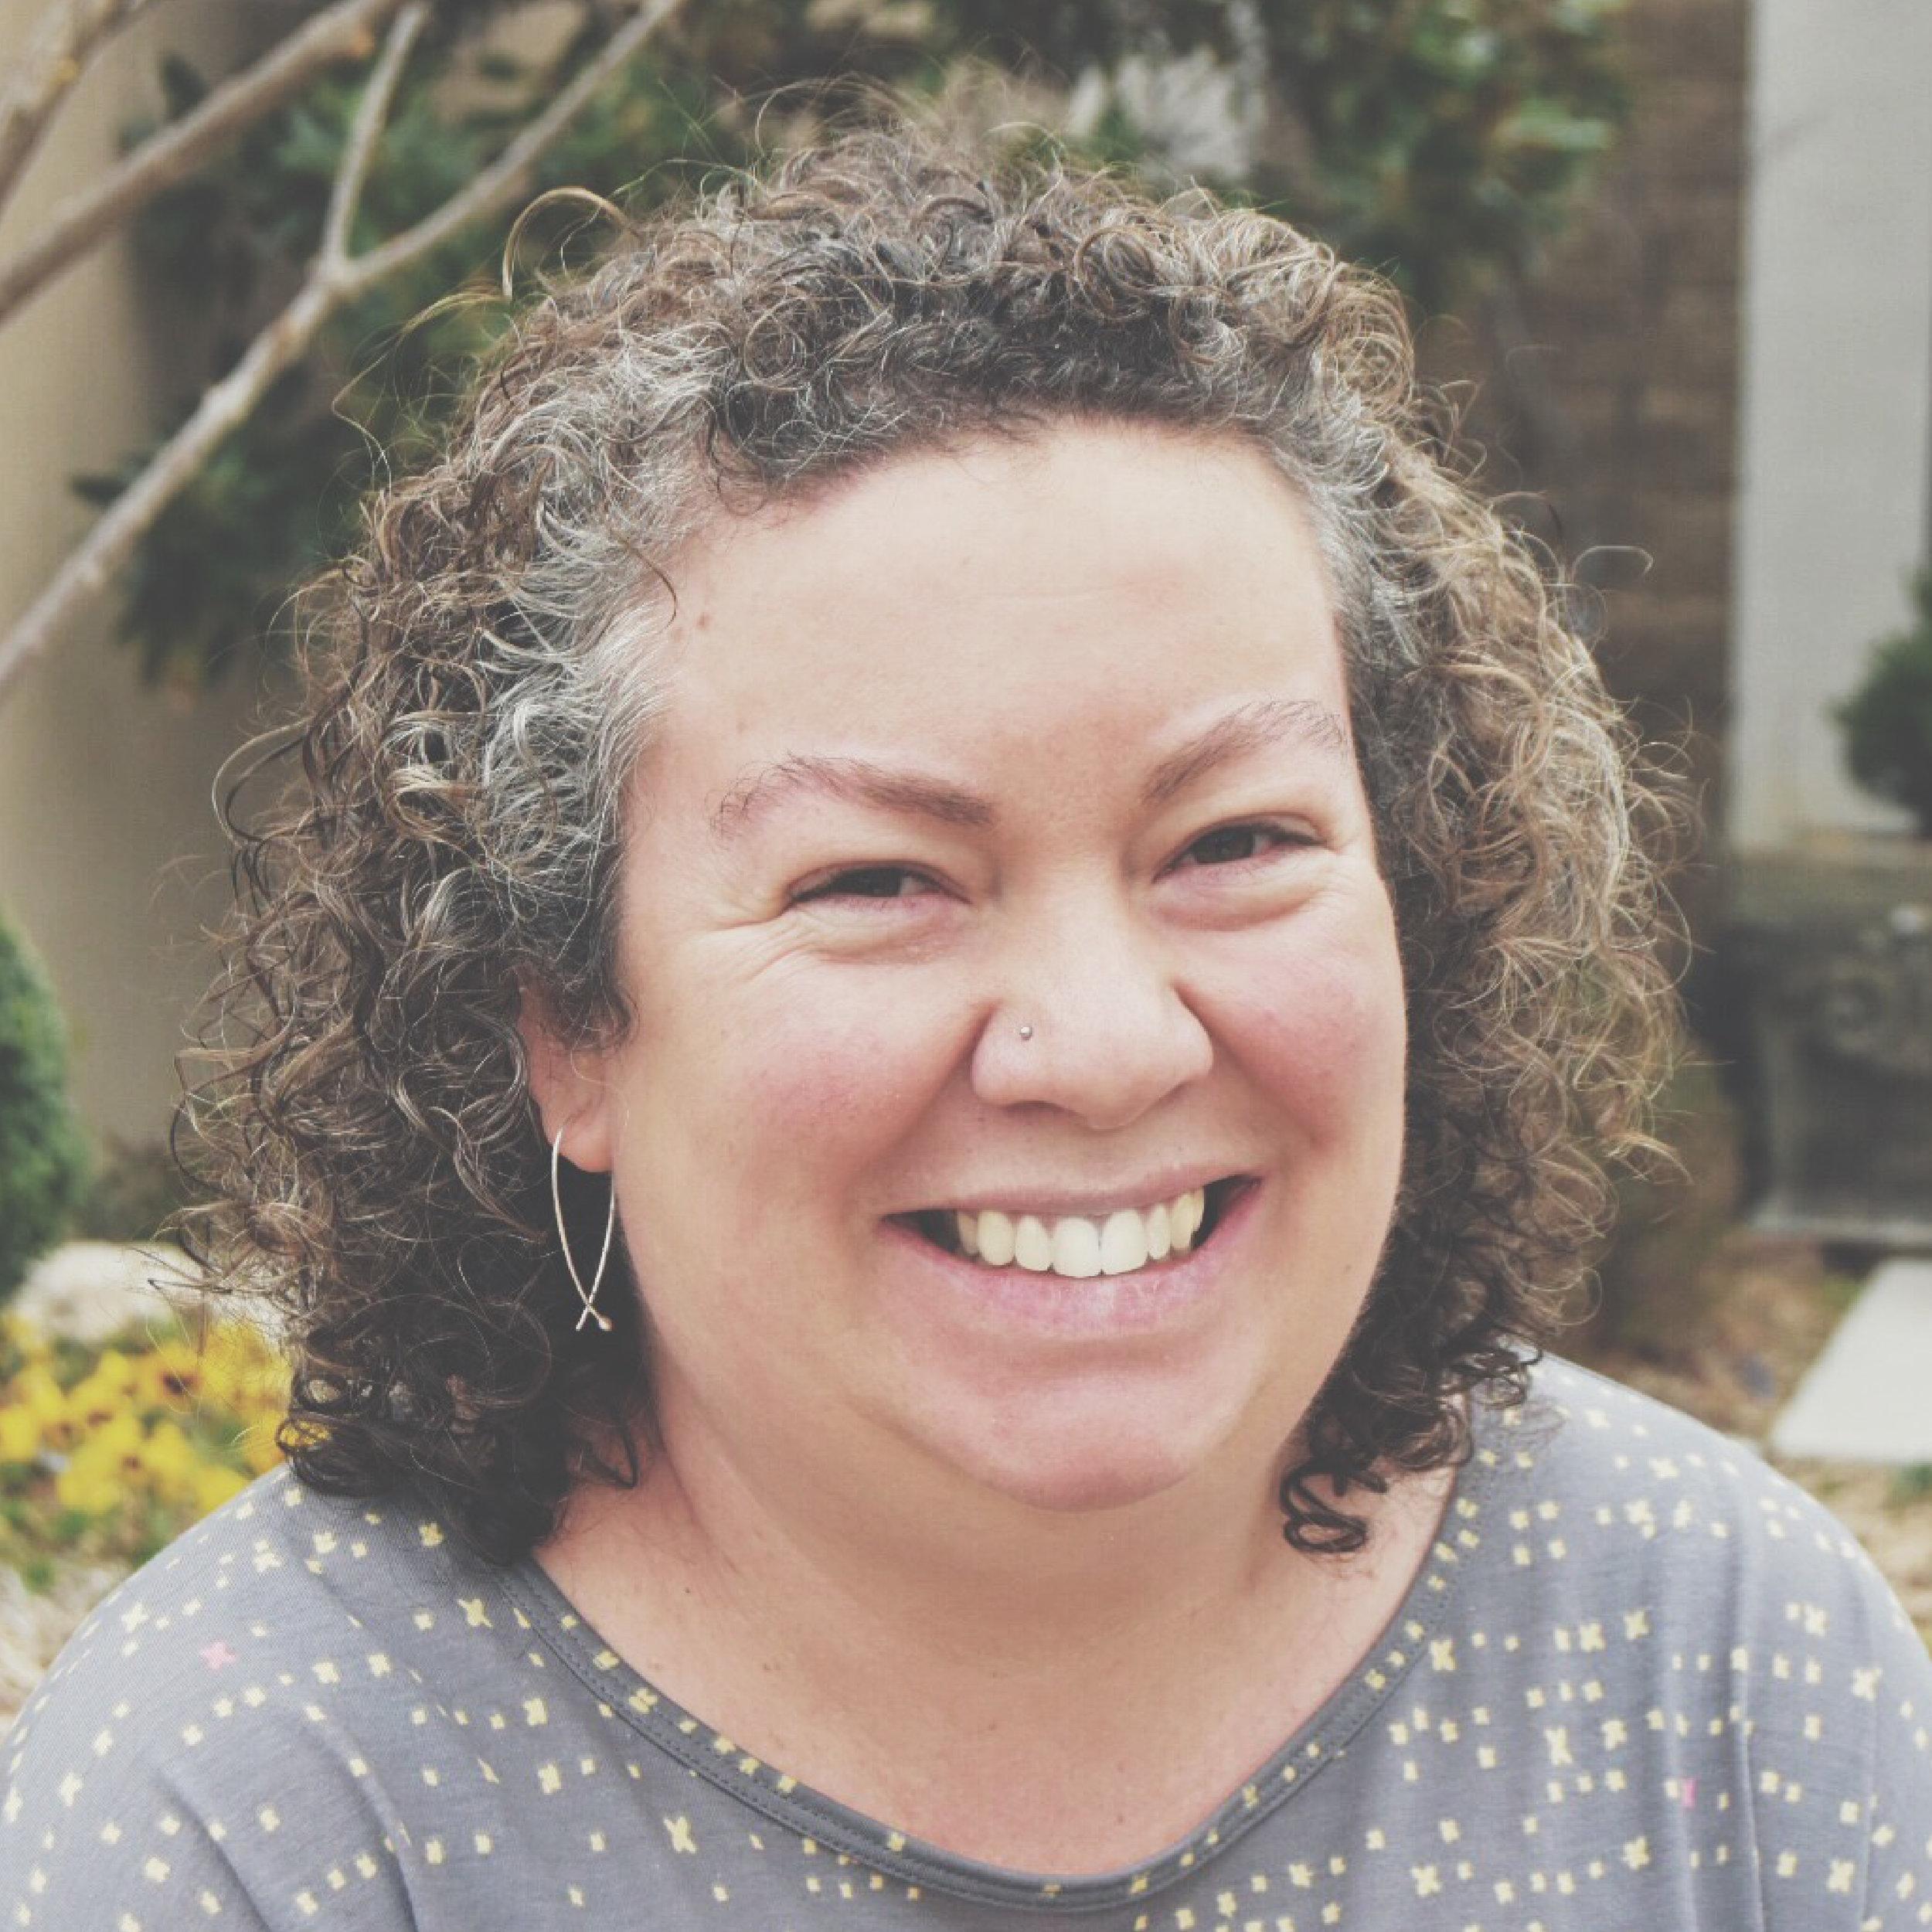 Read More - Stacey Lehwald / Choir Directorstacey@christchurchtulsa.org